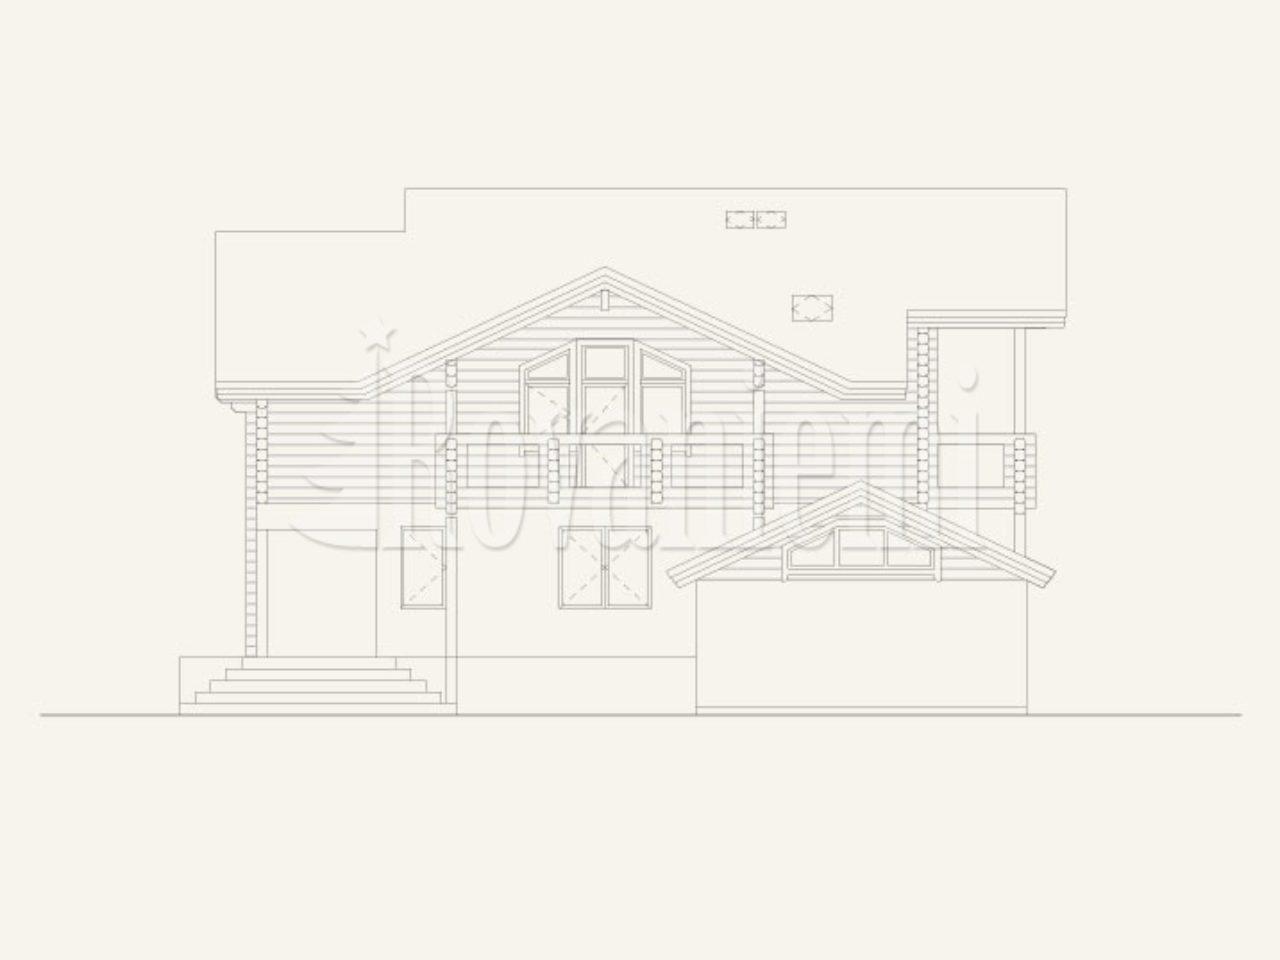 Fasad-1-Solnechnyj